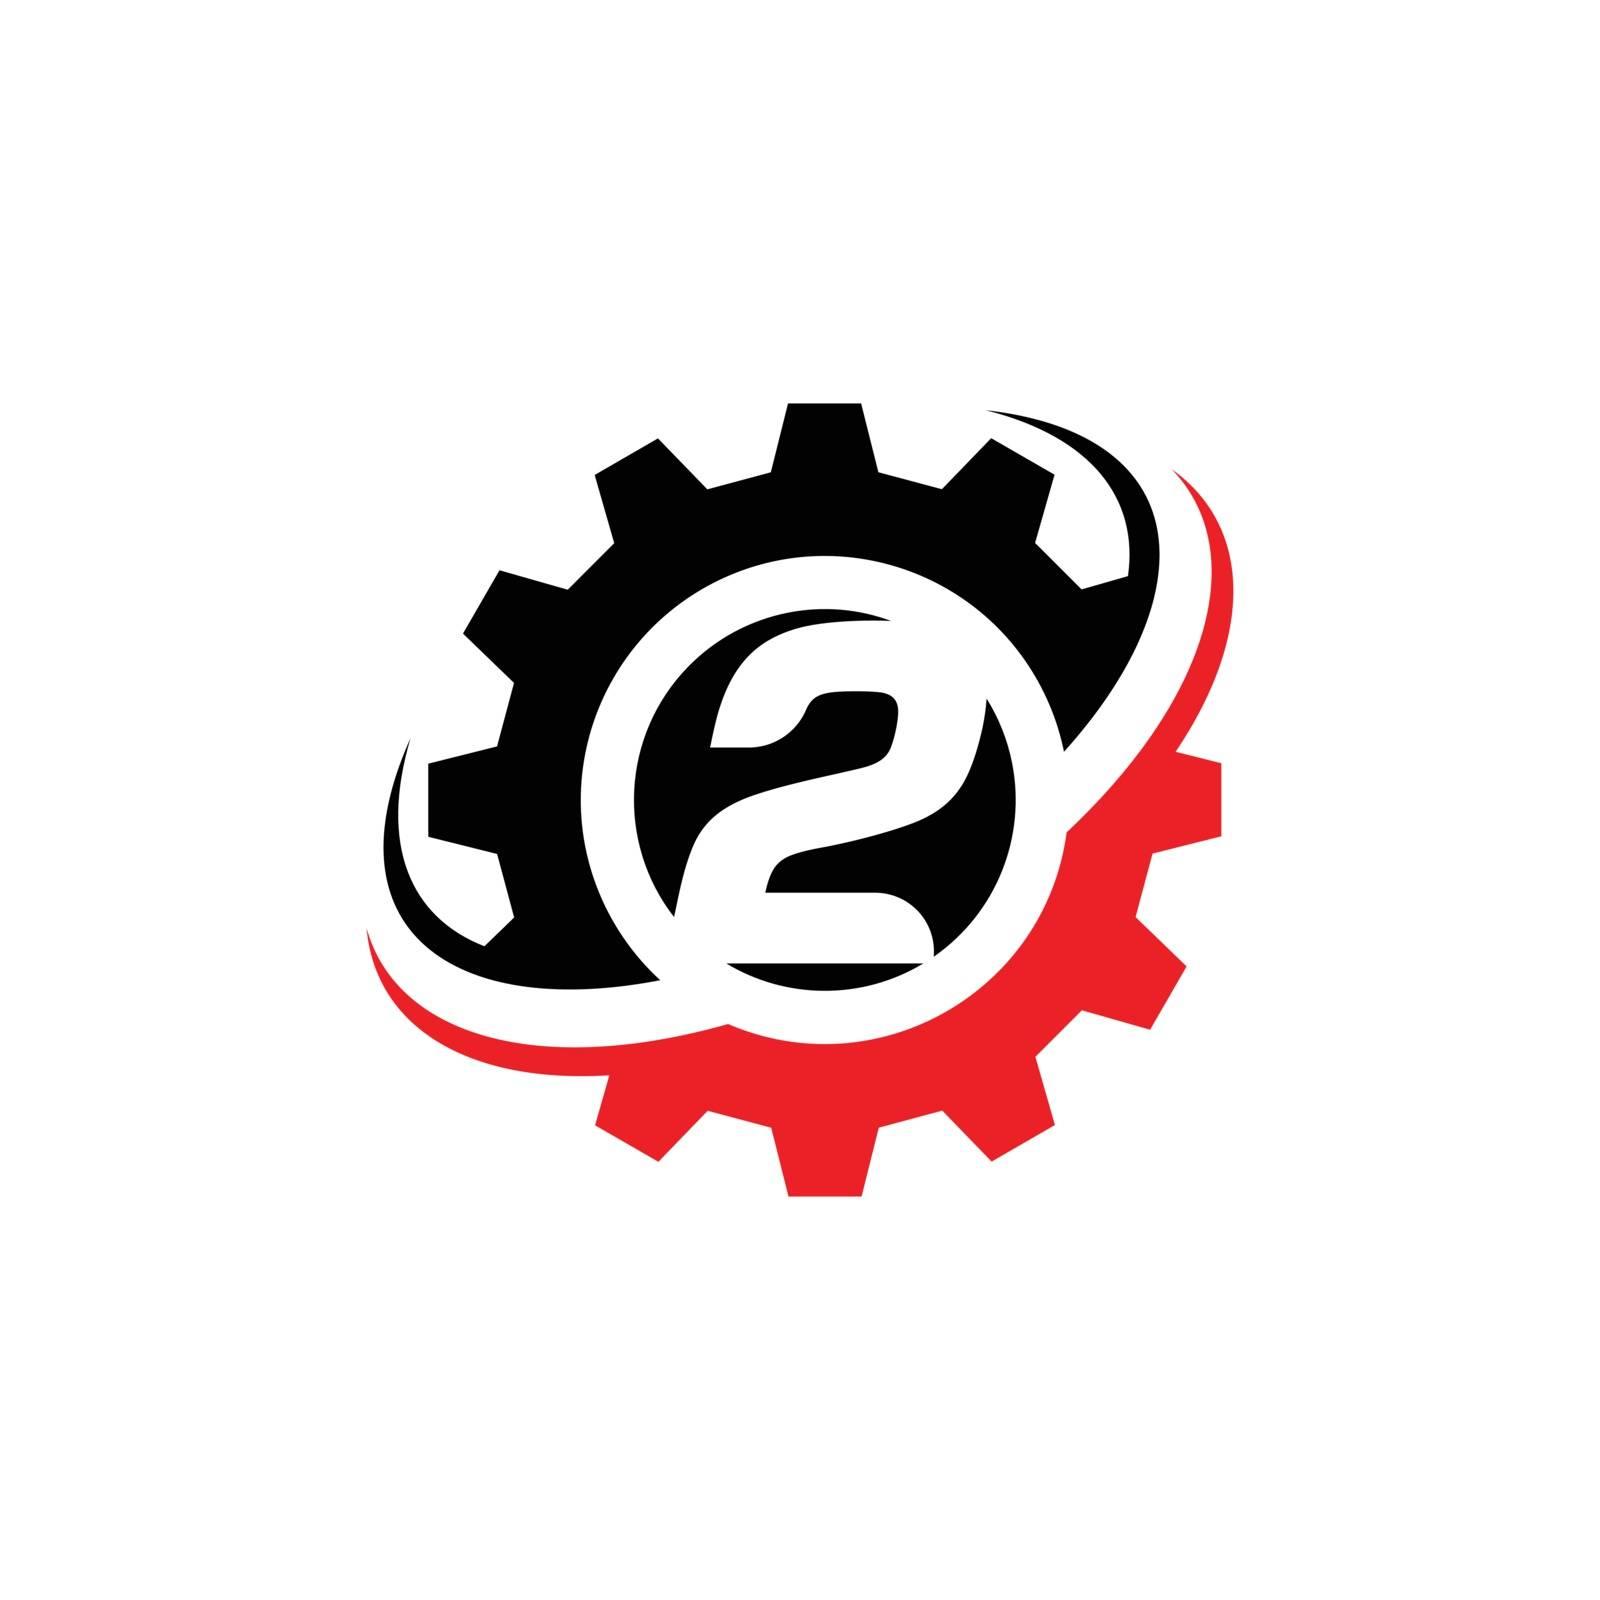 Number 2 Gear Logo Design Template